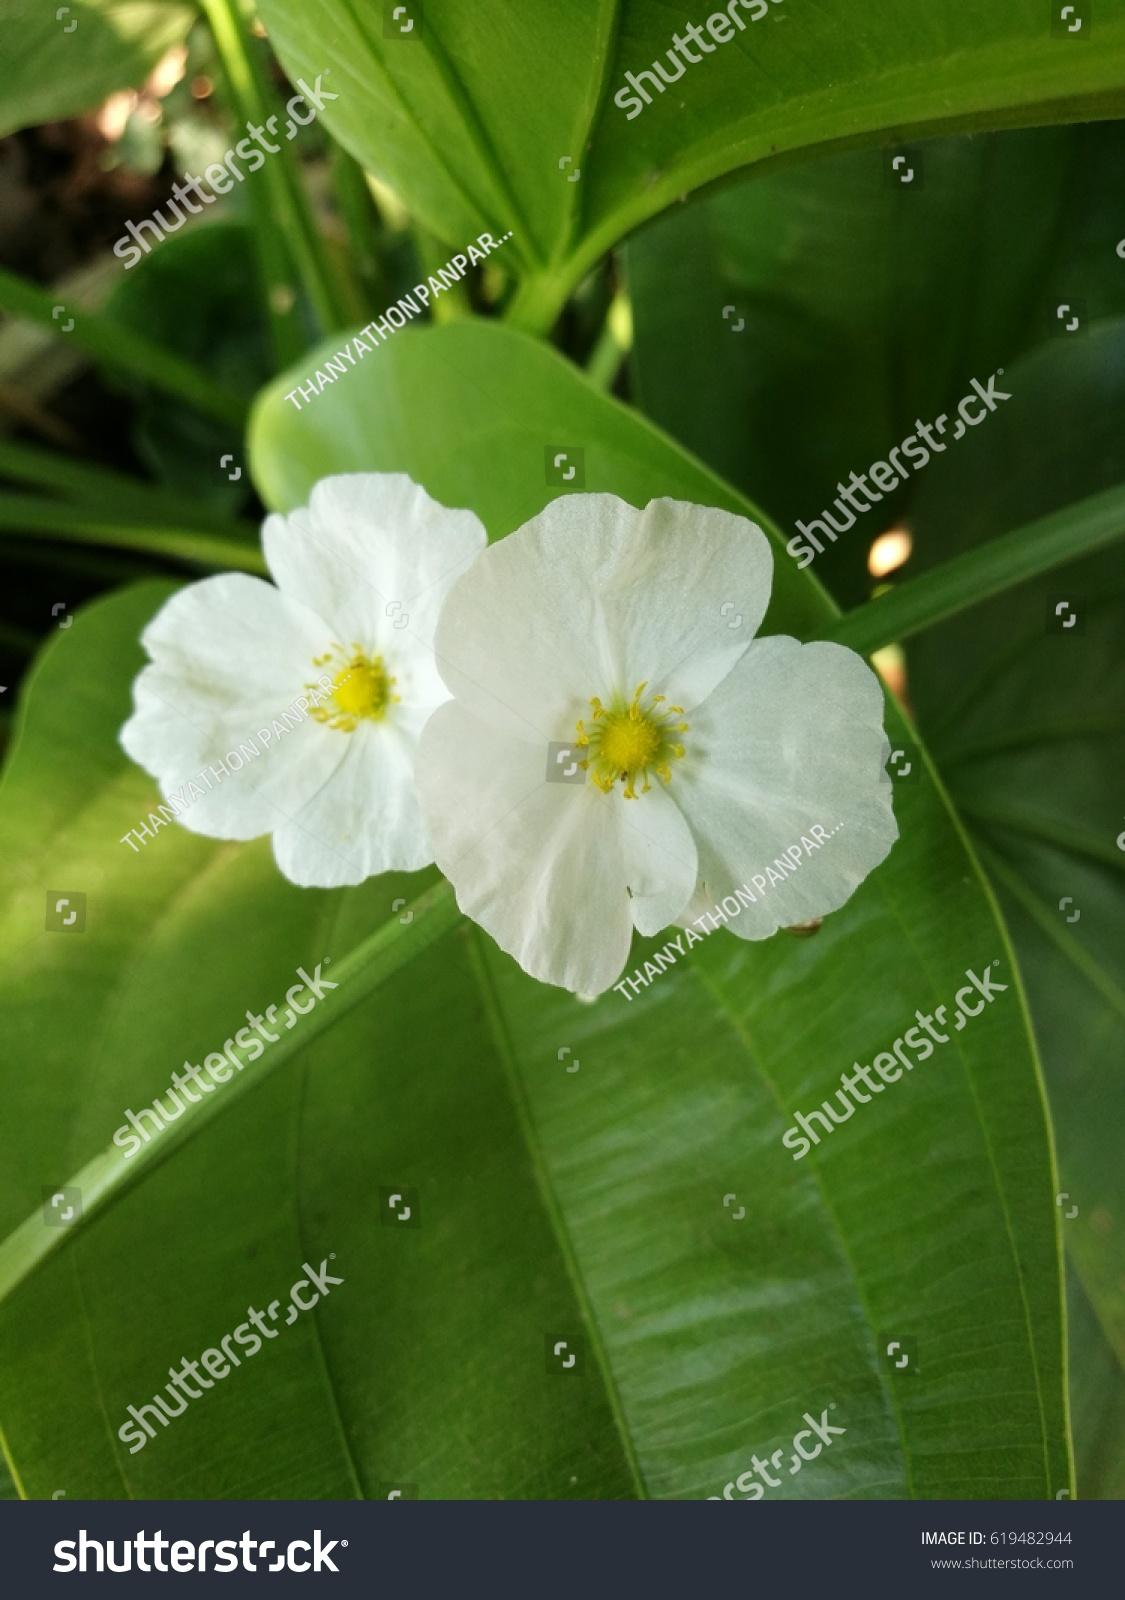 White flowers name cyperaceae stock photo edit now 619482944 white flowers its name cyperaceae mightylinksfo